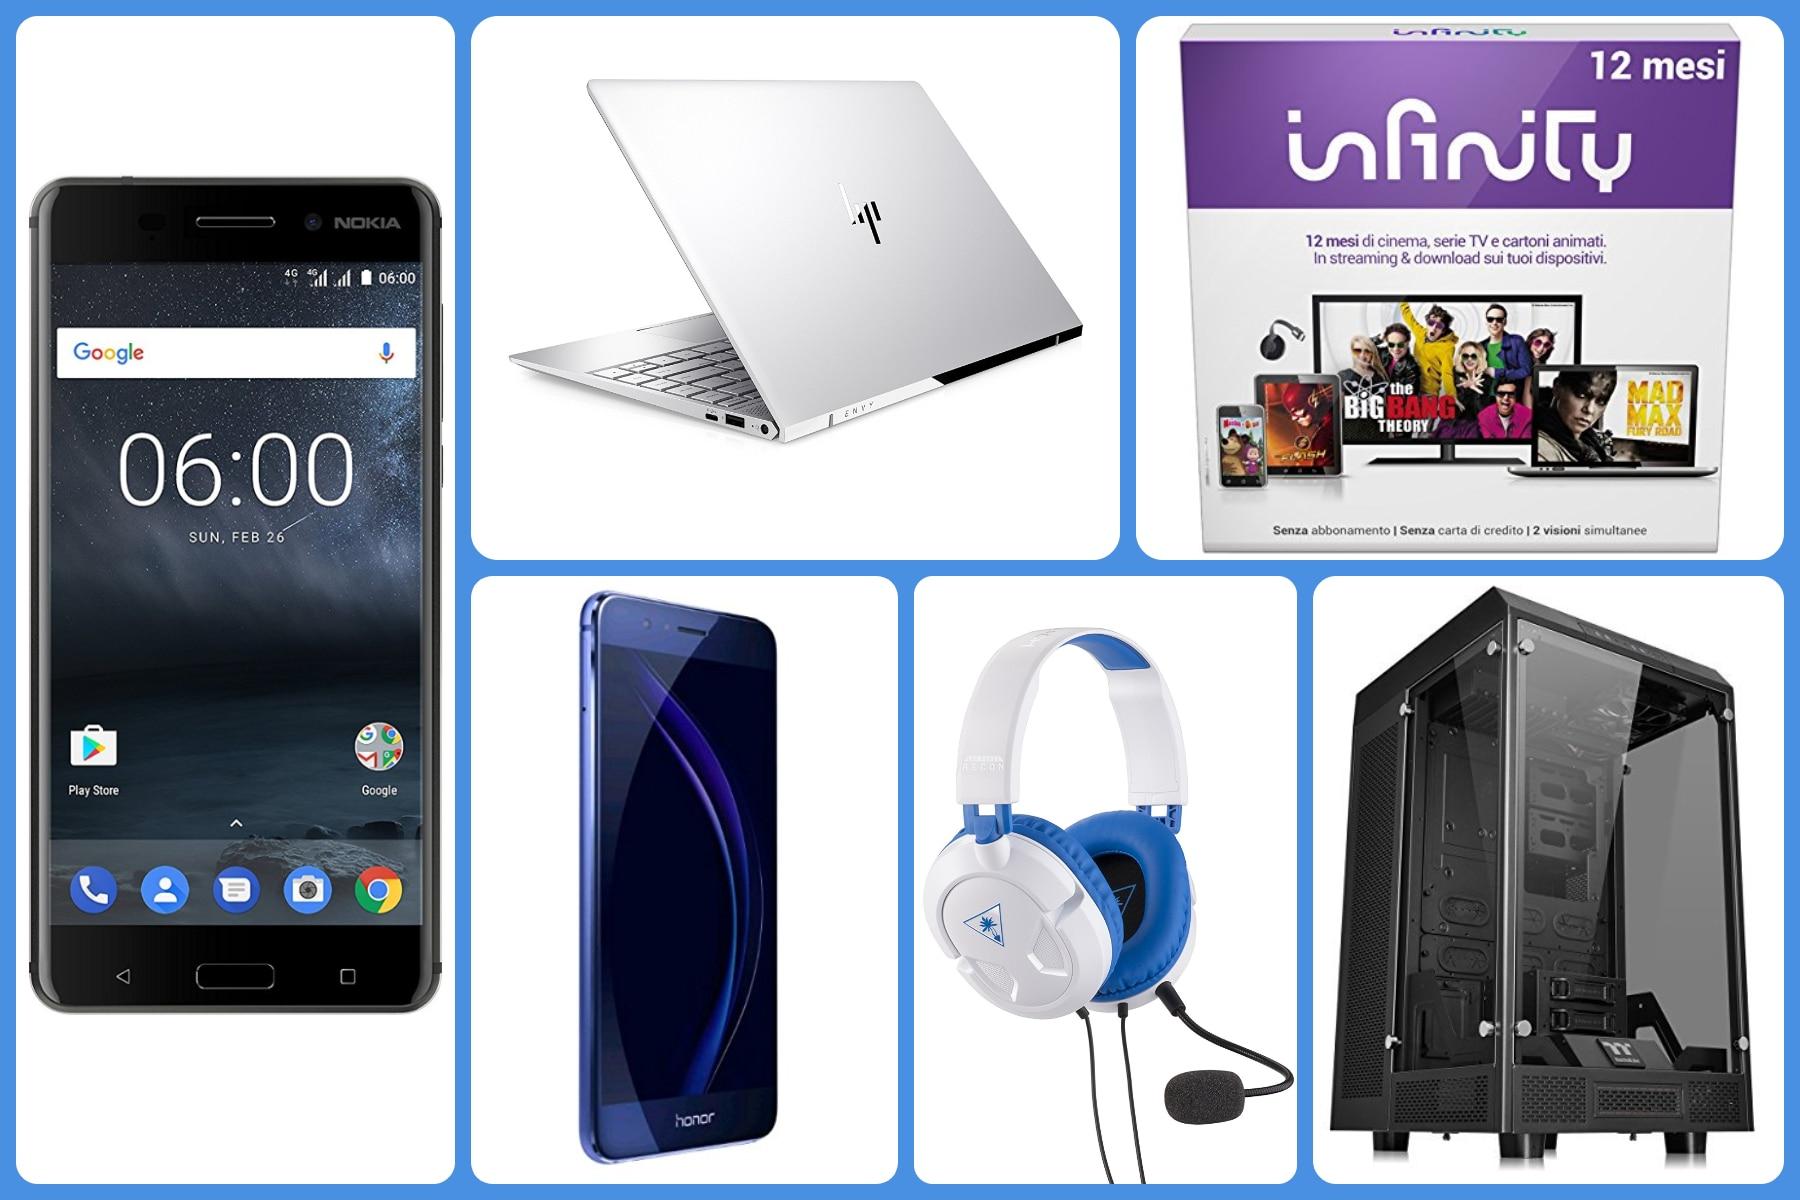 Su Amazon in offerta: Galaxy S9, power bank wireless, Hero Session, cuffie gaming - image migliori-offerte-amazon-16-marzo-2018 on http://www.zxbyte.com